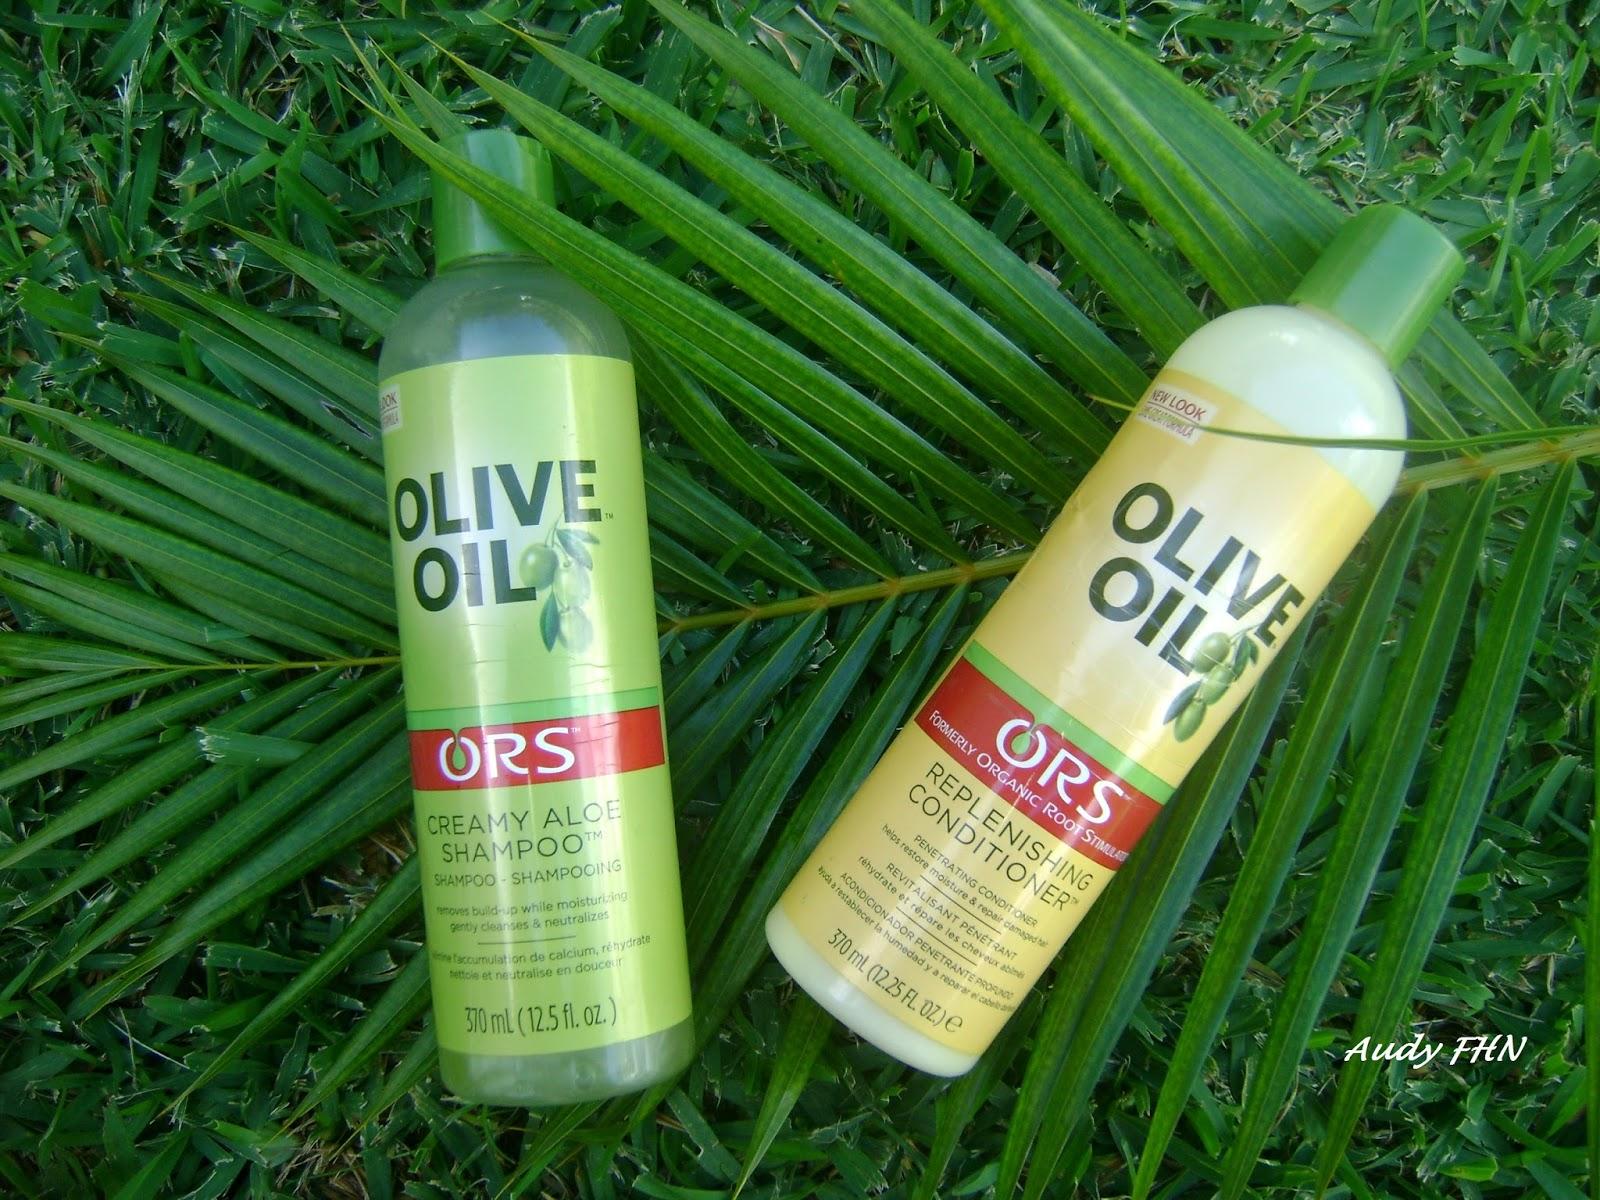 mon avis sur la gamme olive oil de la marque organic root stimulator audy fhn blog mode. Black Bedroom Furniture Sets. Home Design Ideas